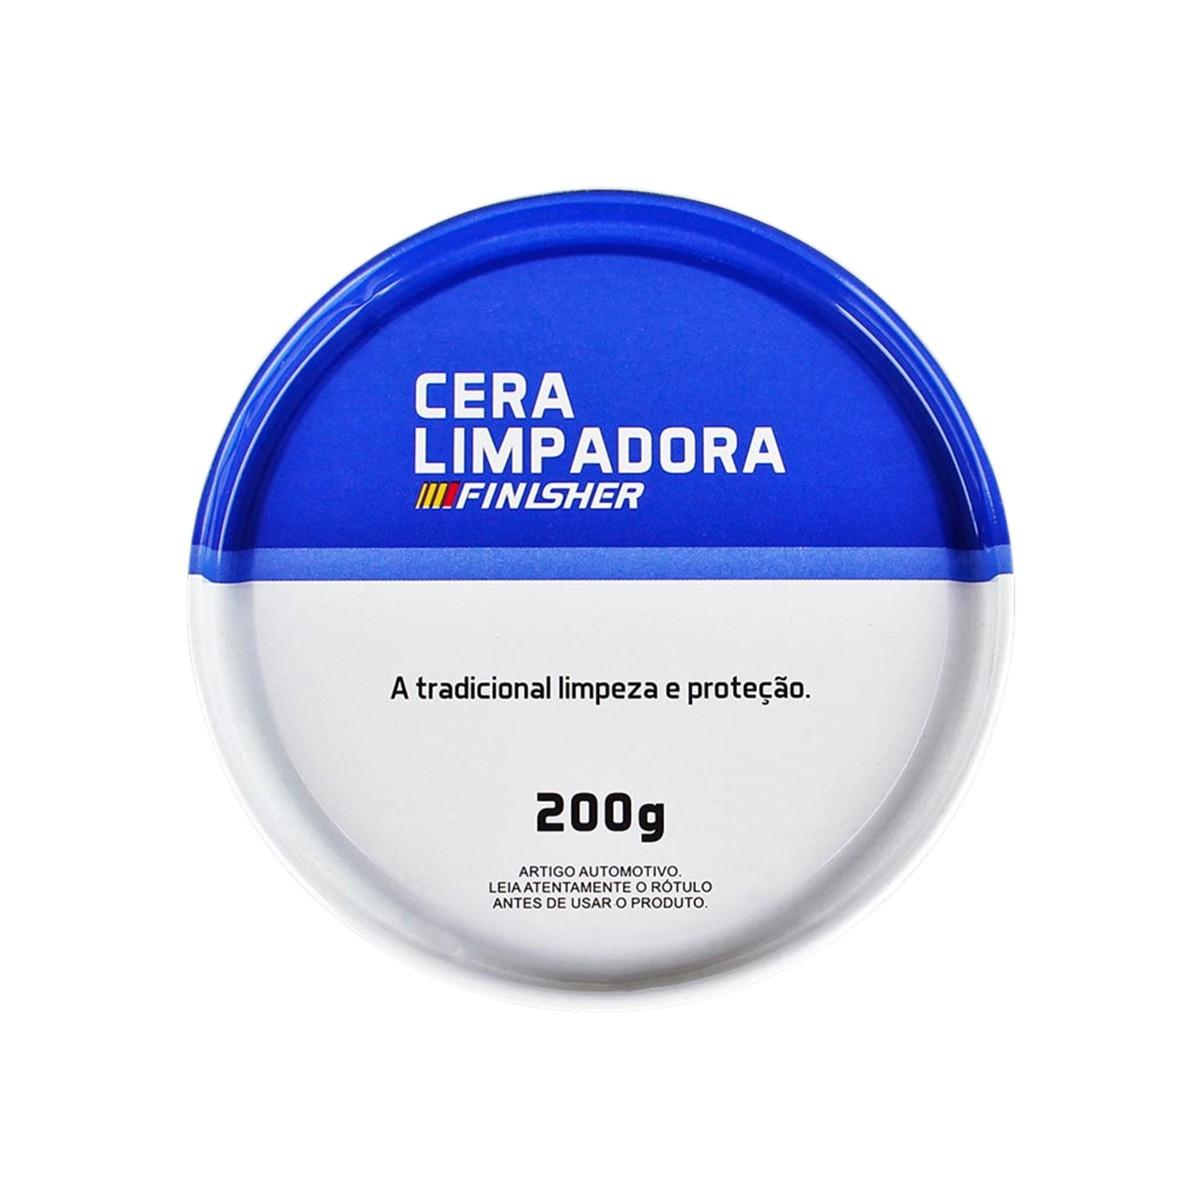 Cera Limpadora 200g Finisher